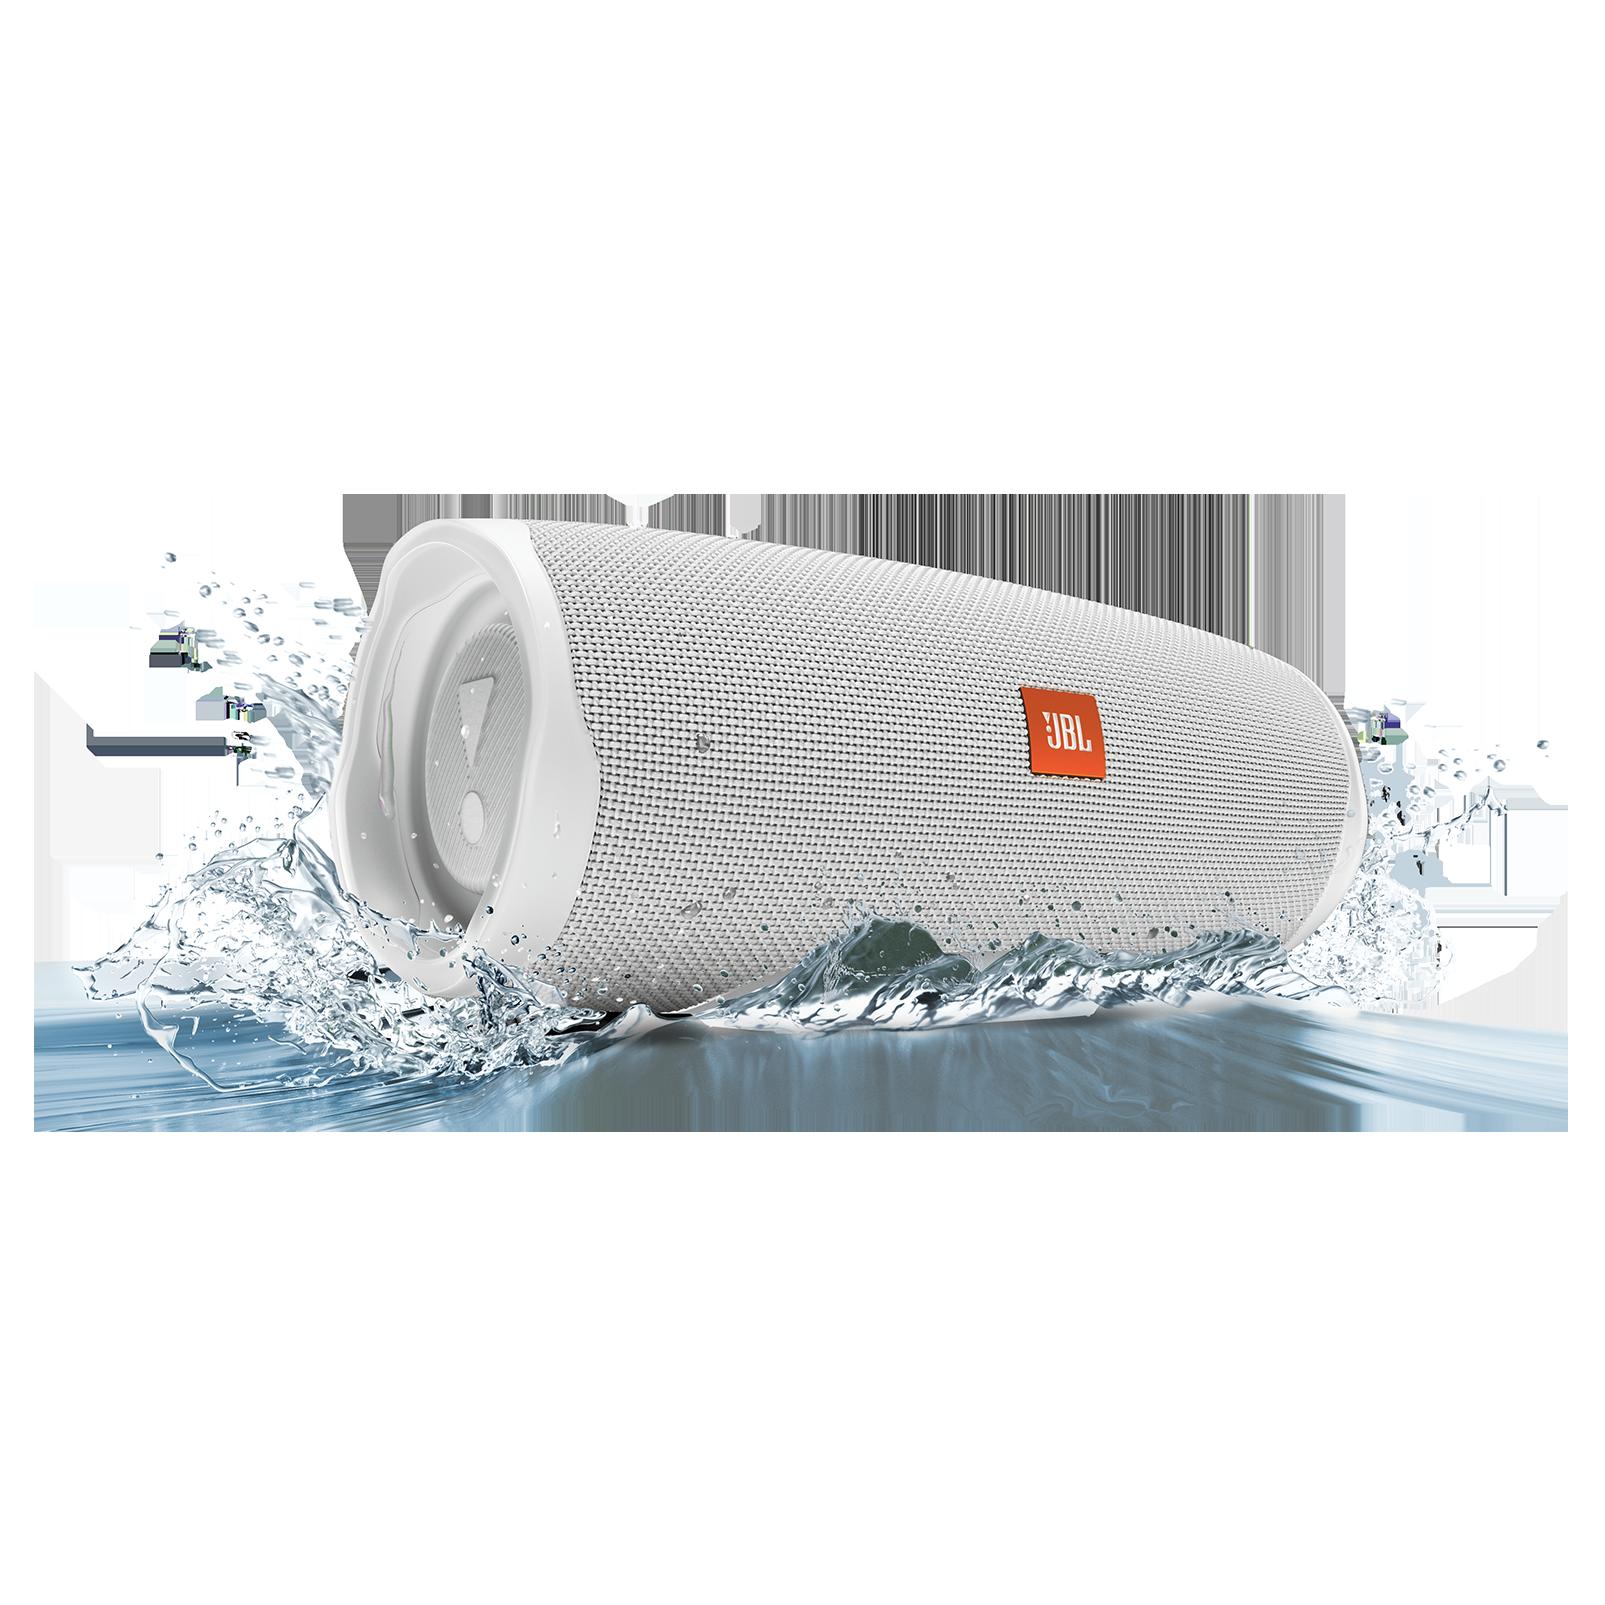 JBL Charge 4 - White - Portable Bluetooth speaker - Detailshot 5